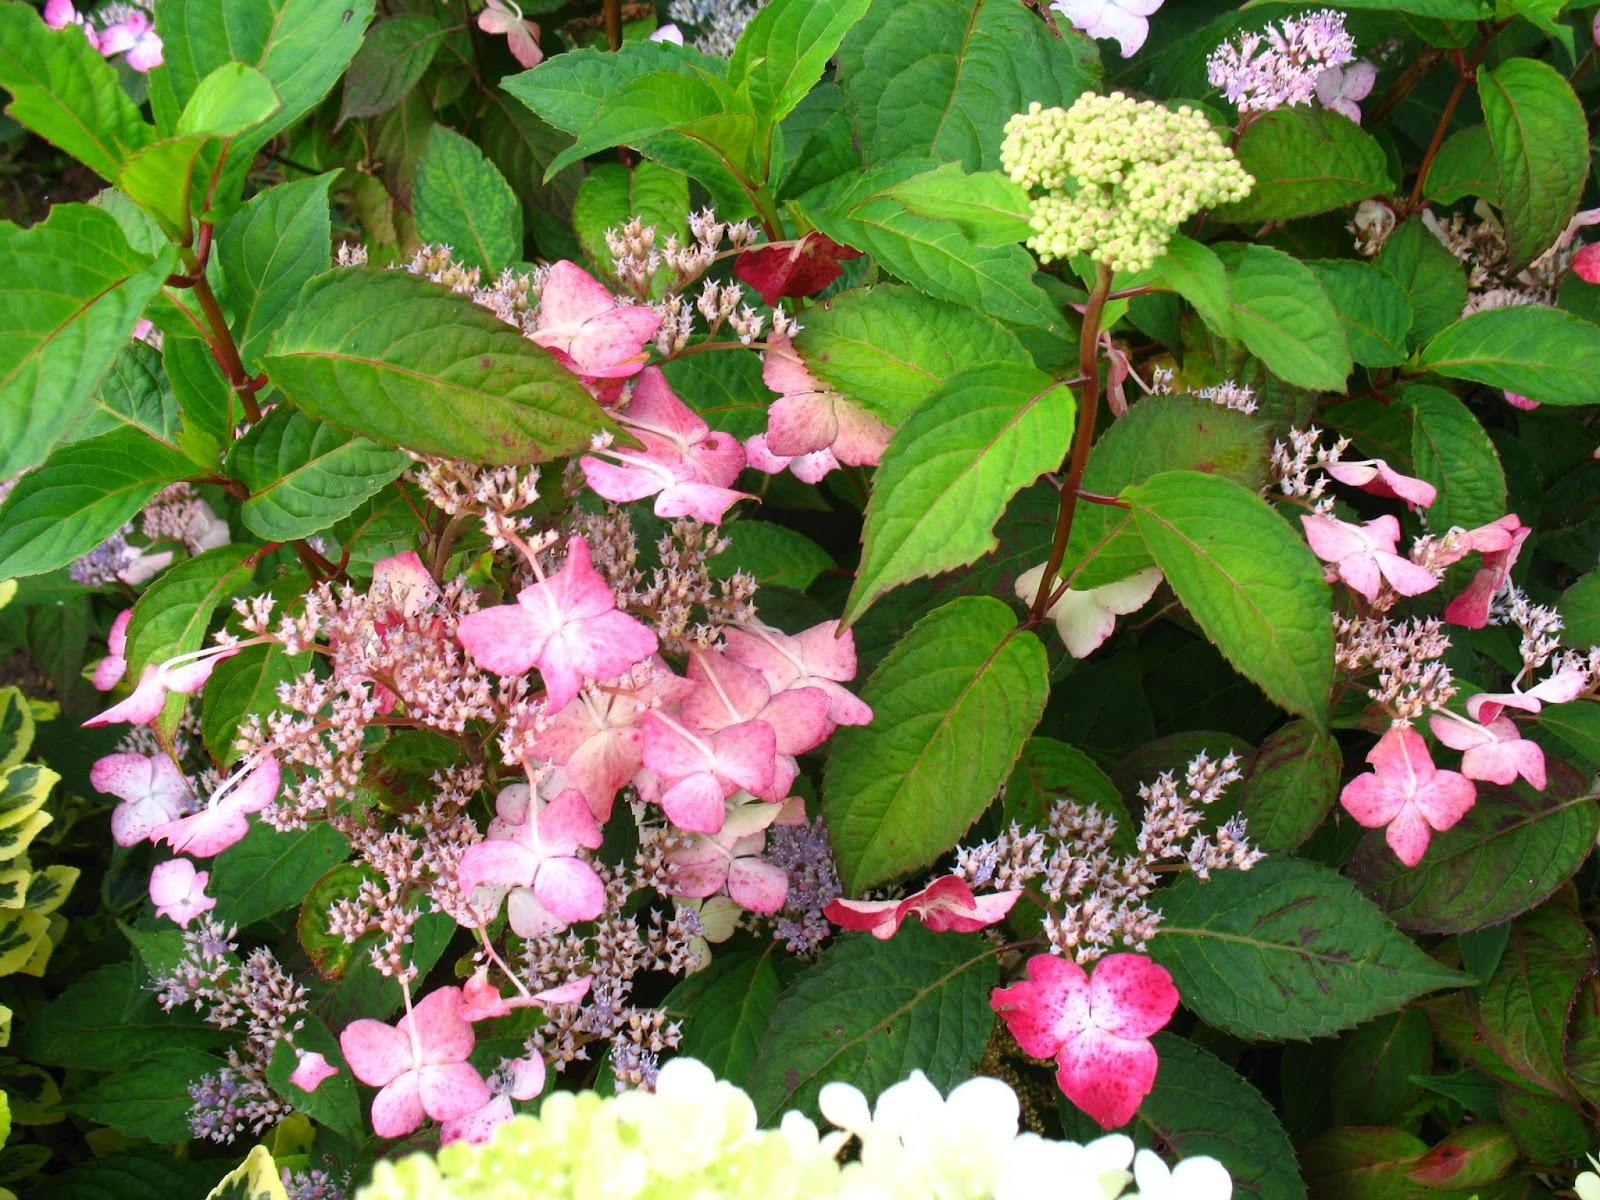 Roses du jardin ch neland hydrang a serrata kurenai - Mon voisin fait du feu dans son jardin ...